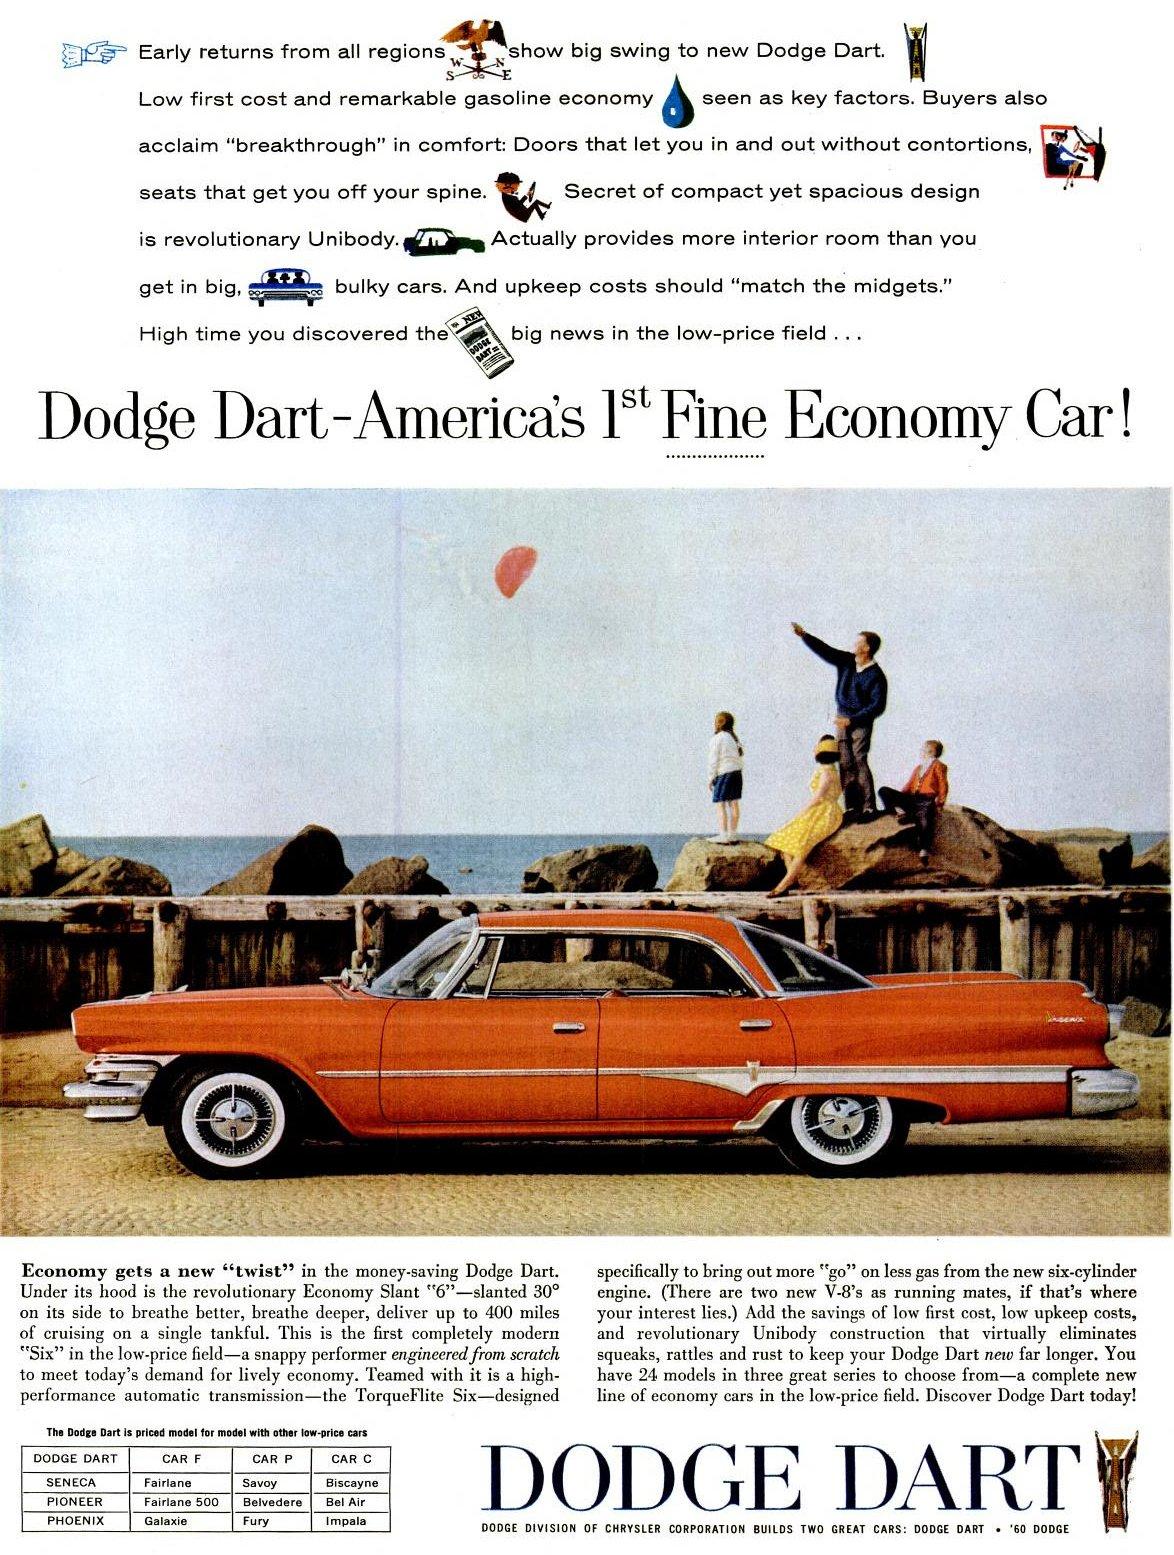 Jan 18, 1960 Dodge Dart